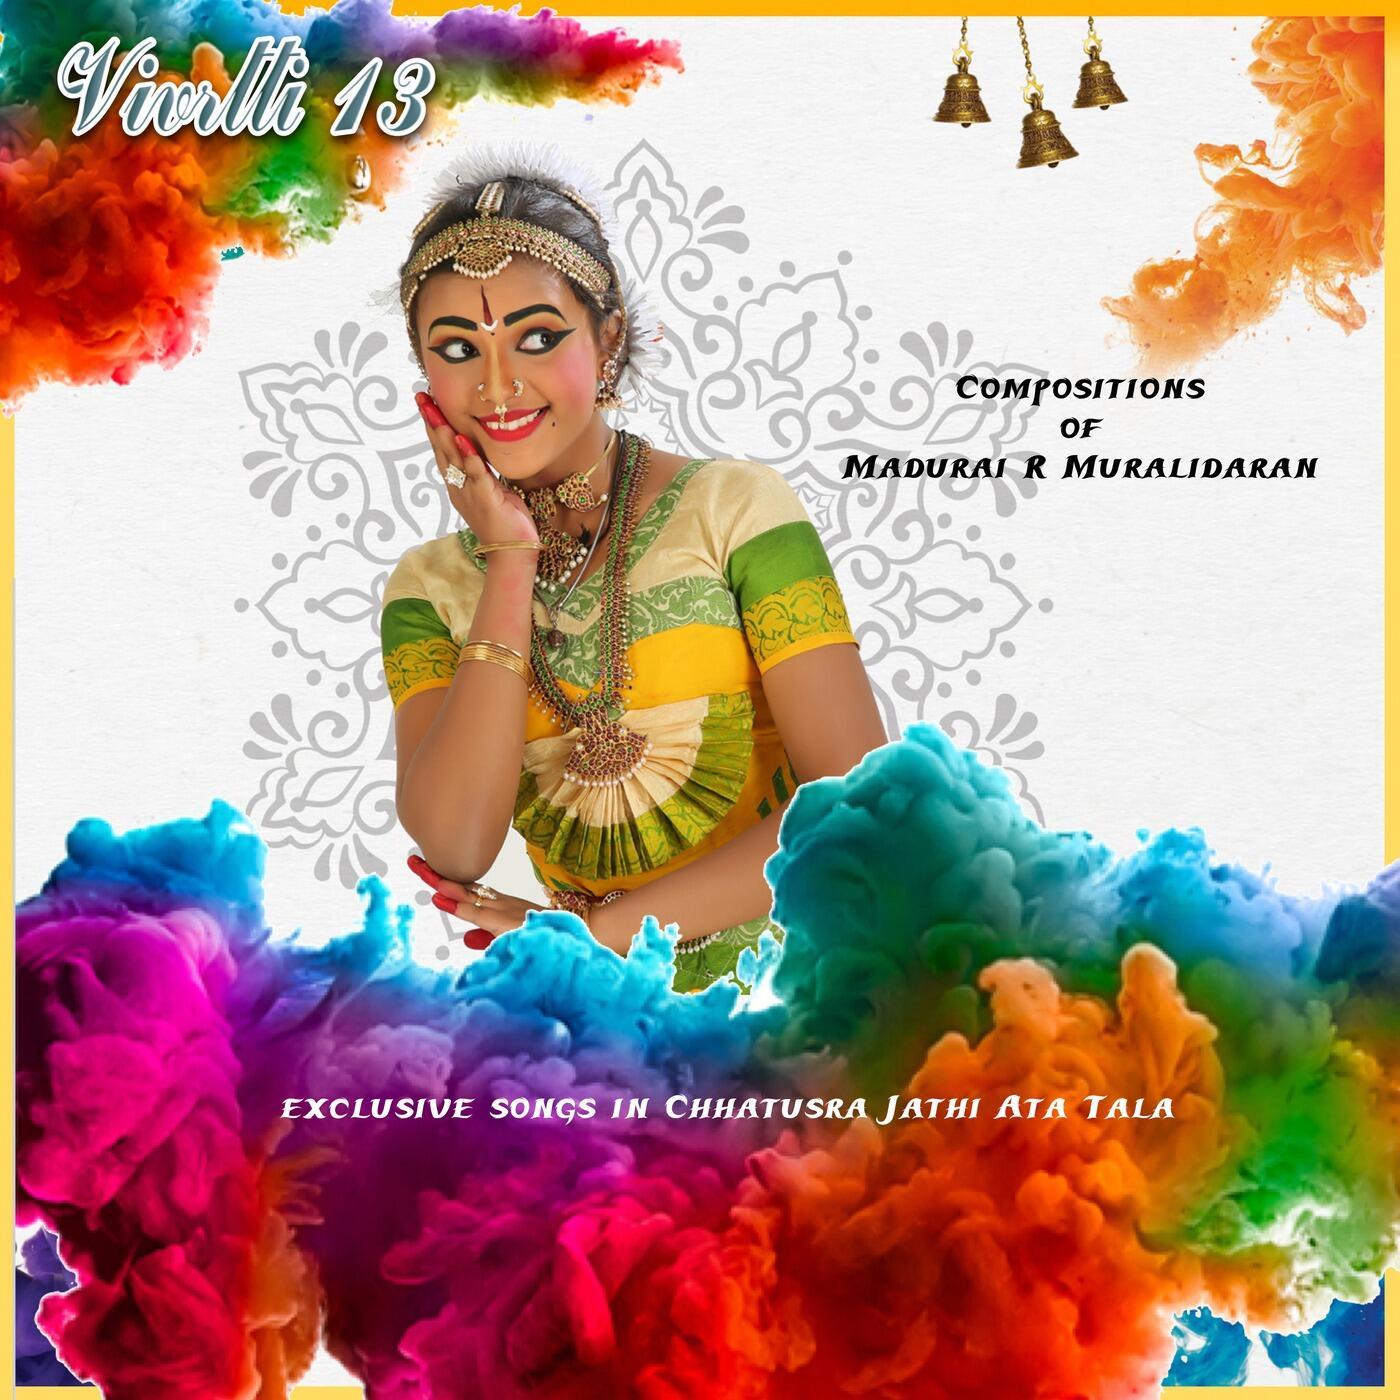 Stream Free Songs by Madurai R  Muralidaran & Similar